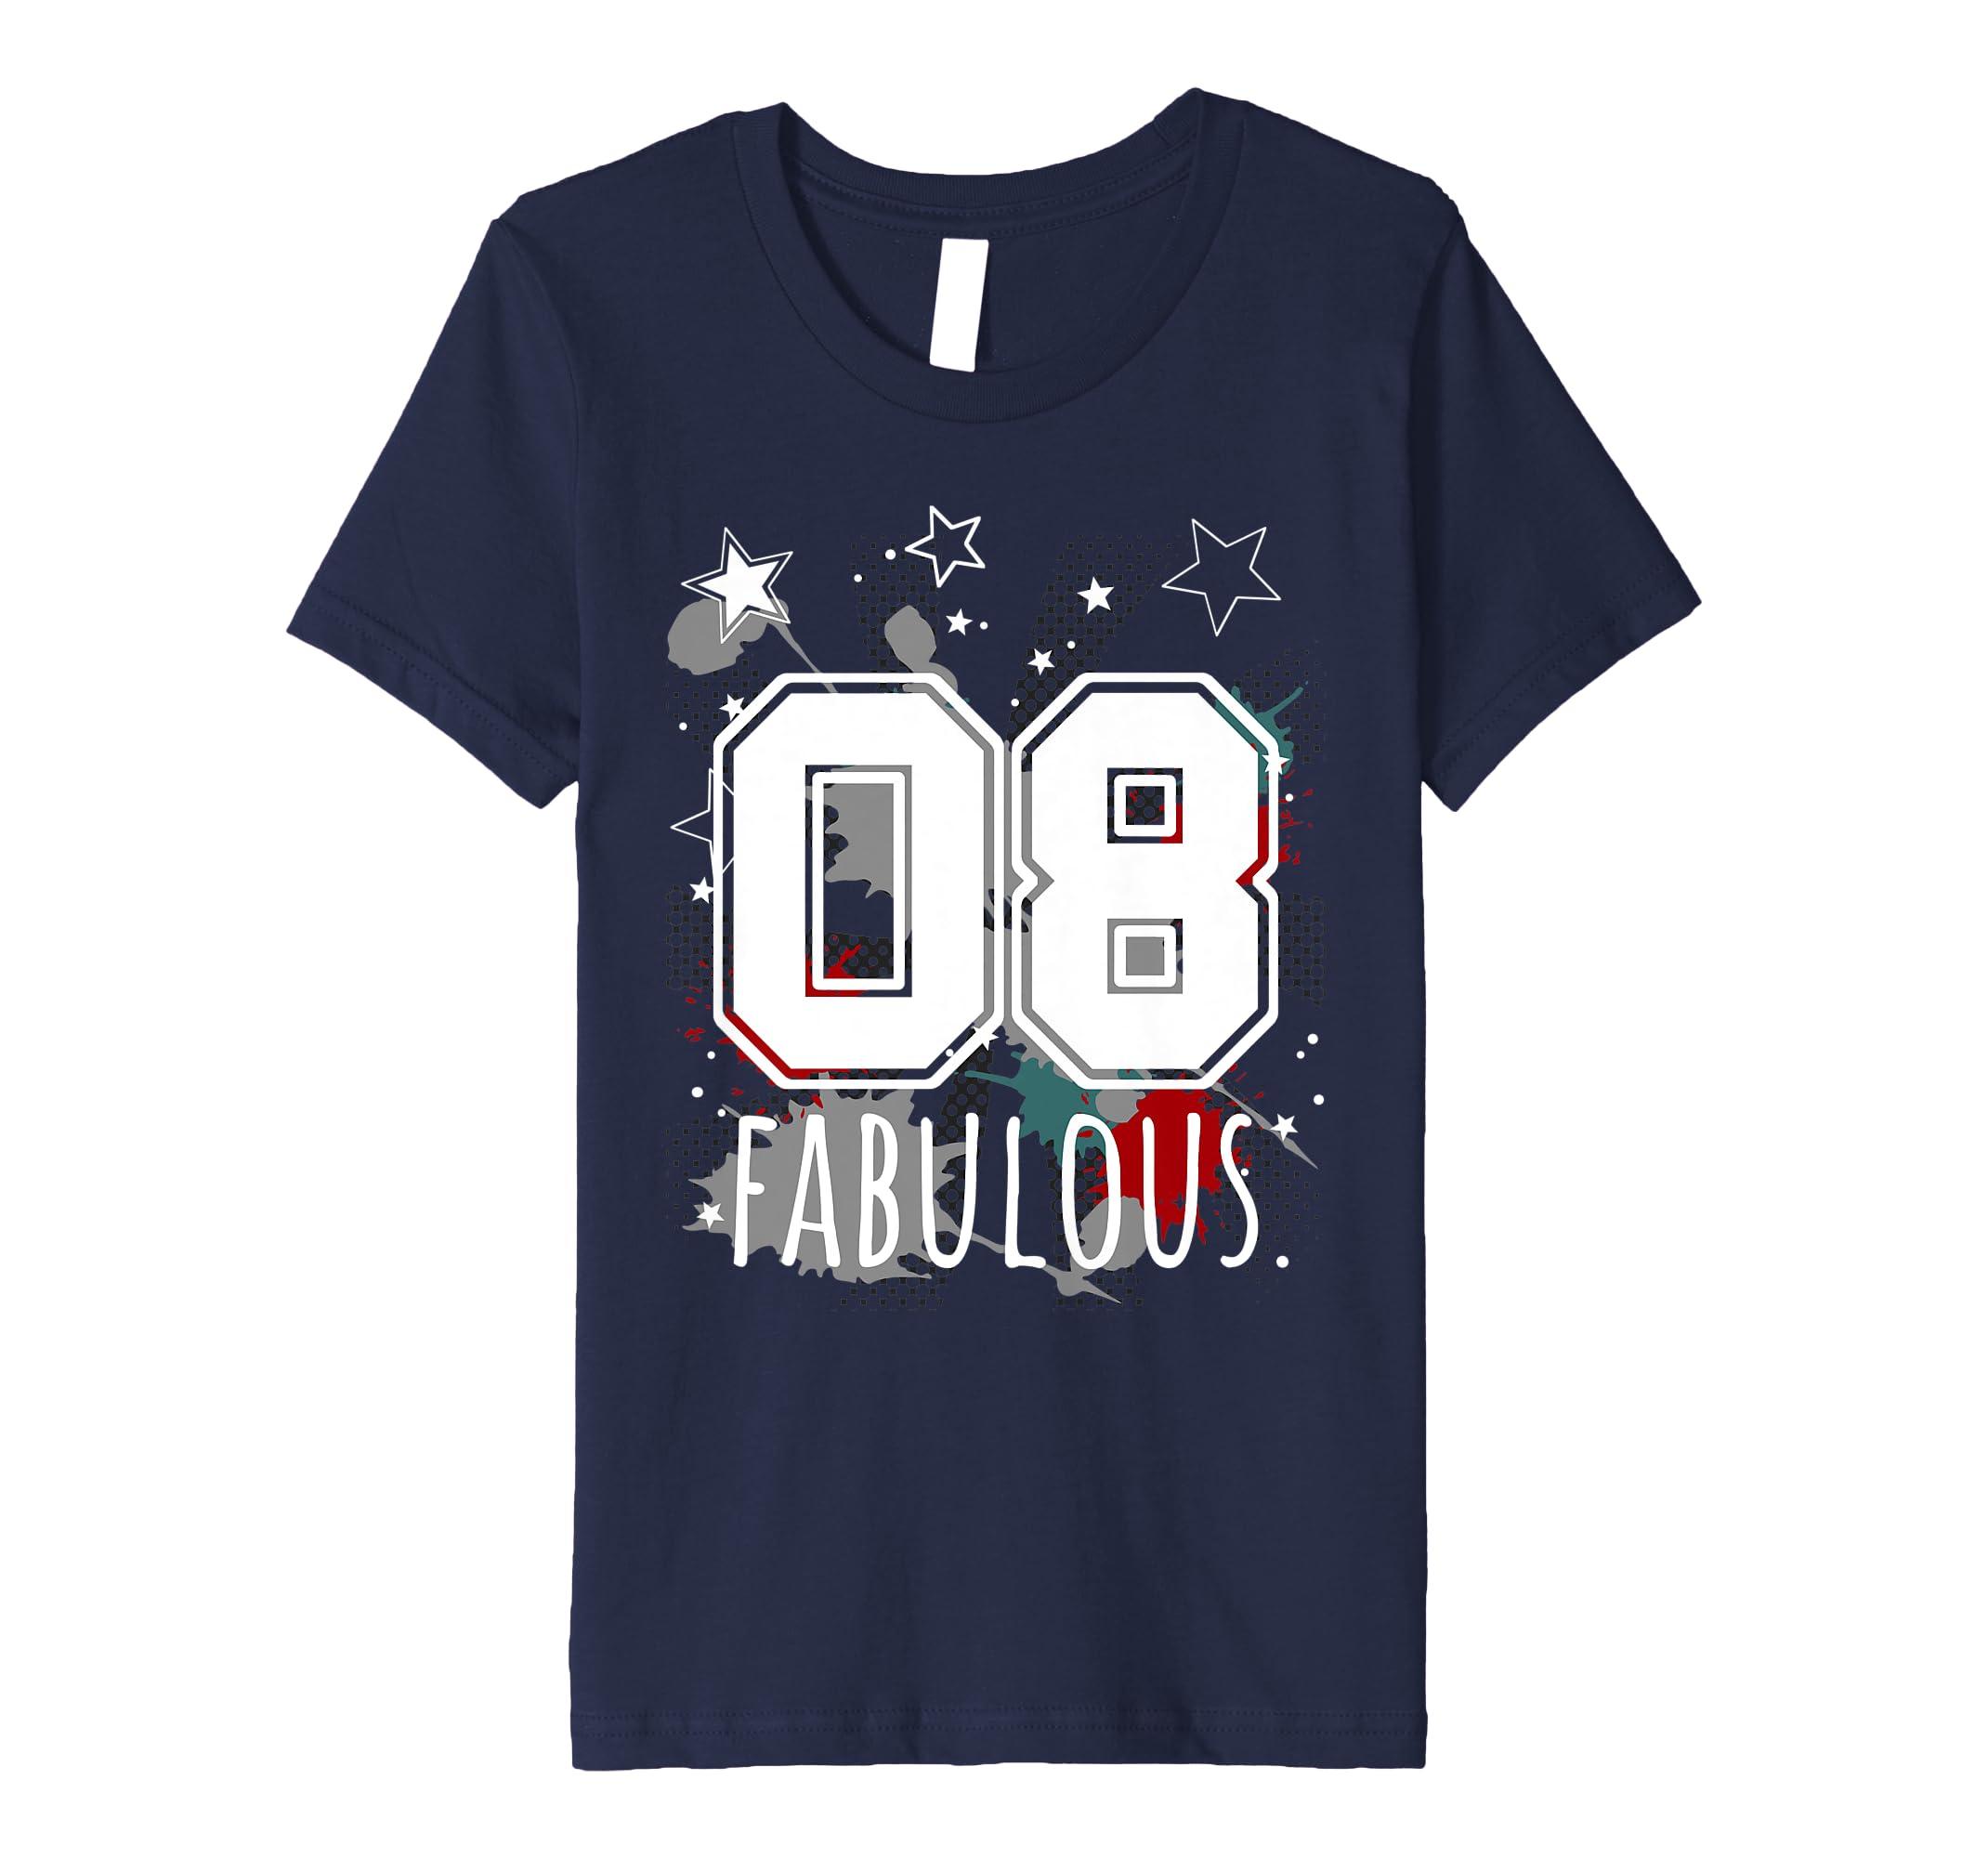 8th birthday t shirt big college number graffiti 8 yrs old amazon co uk clothing